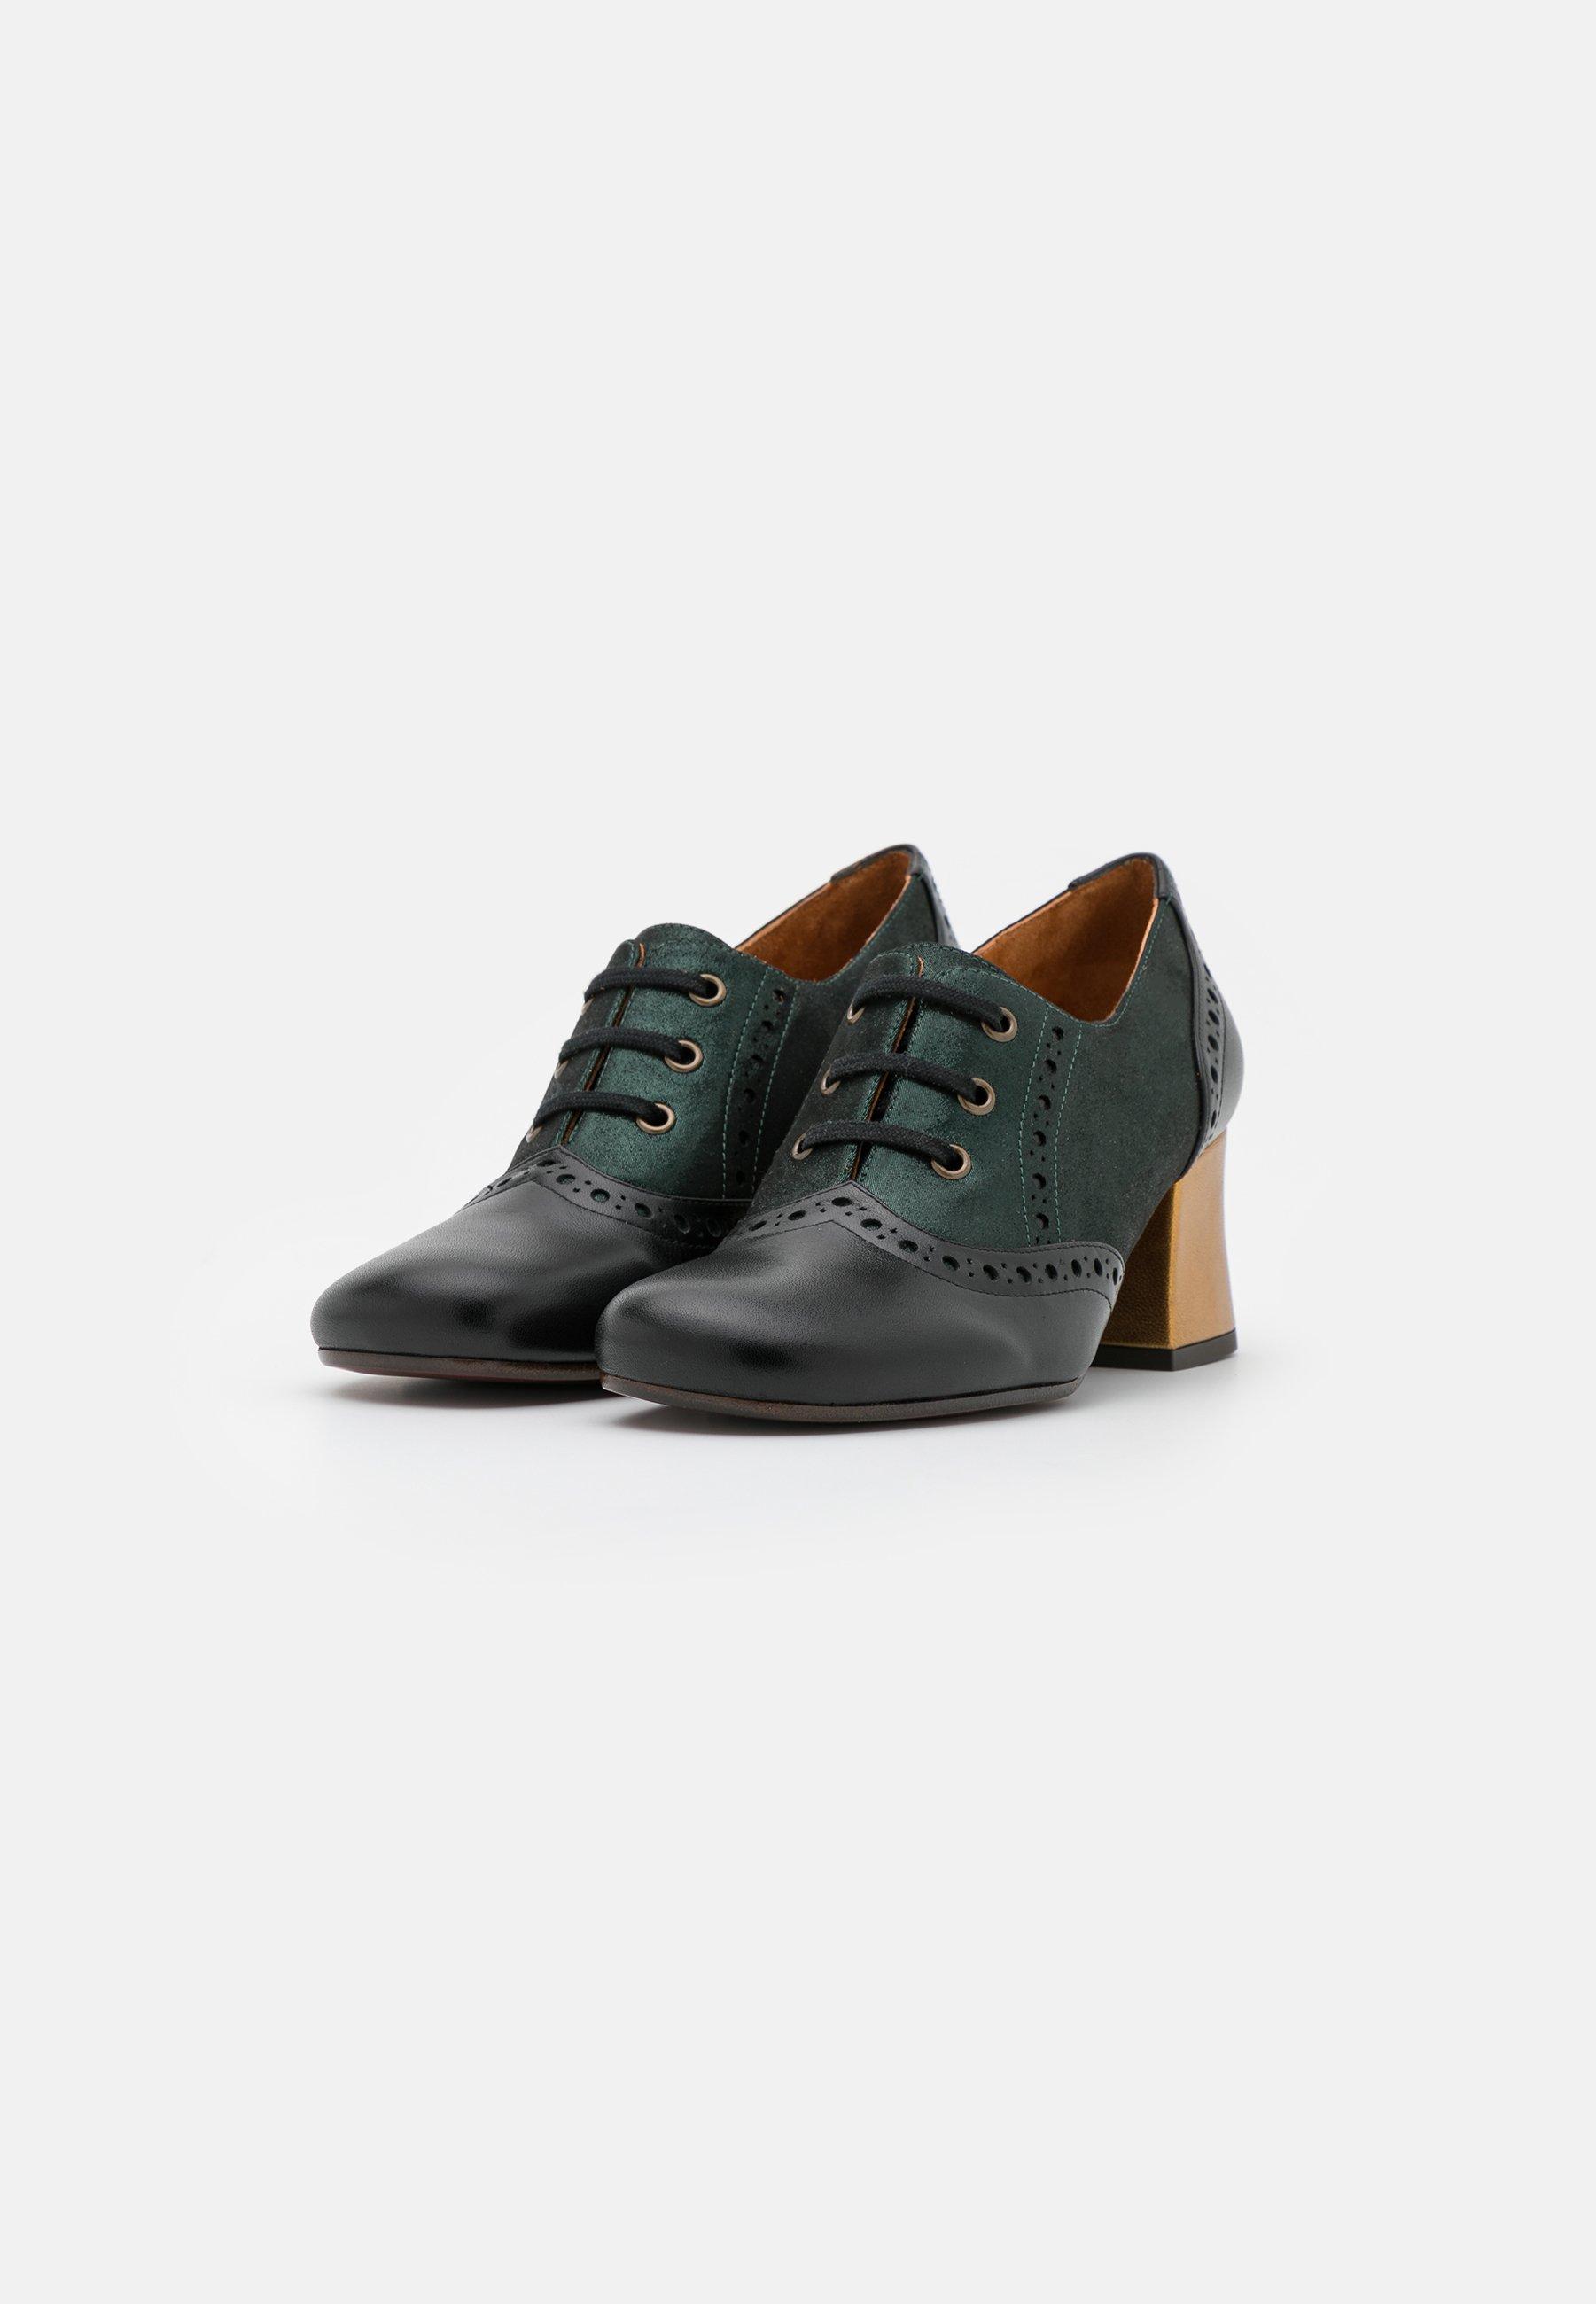 Women MICUCA - Lace-up heels - metallic green